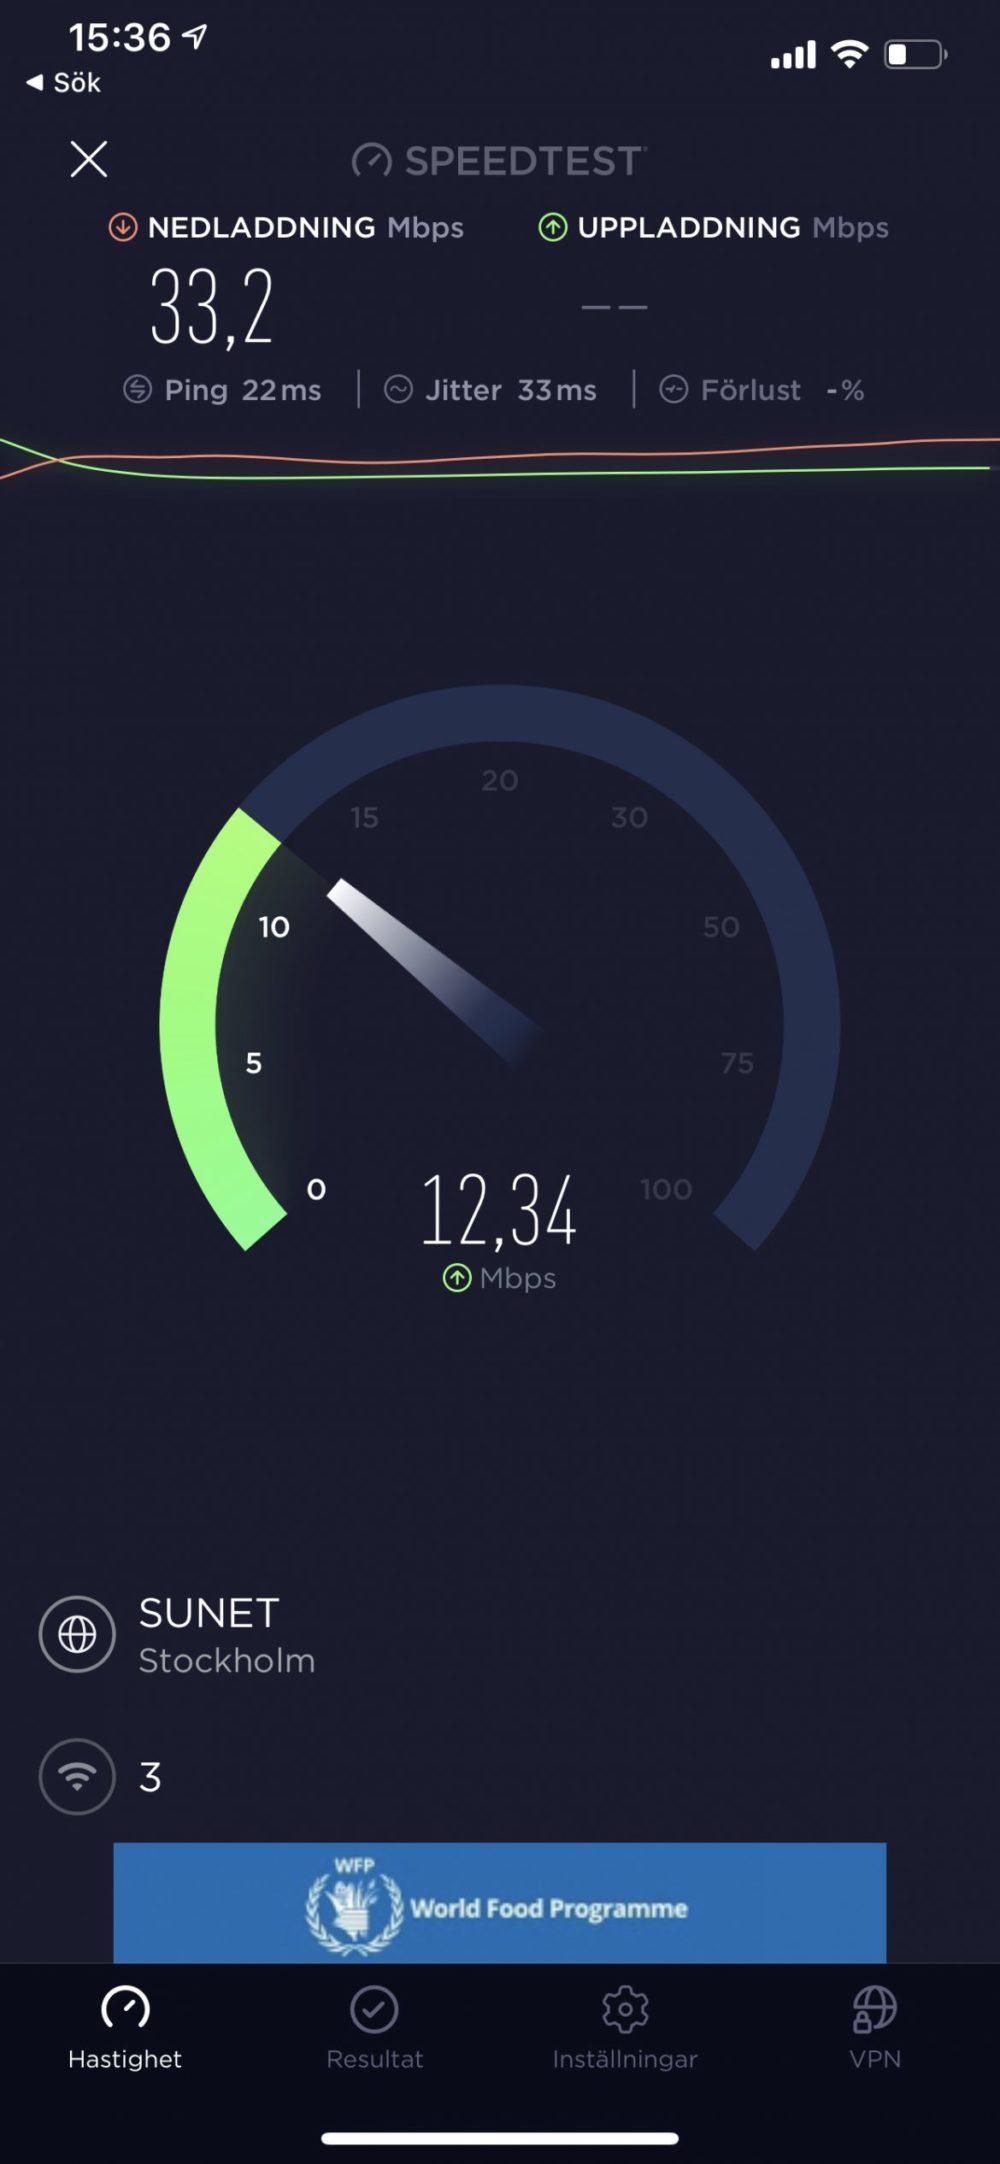 M2 Speedtest Sunet 4G iphone 11 pro max